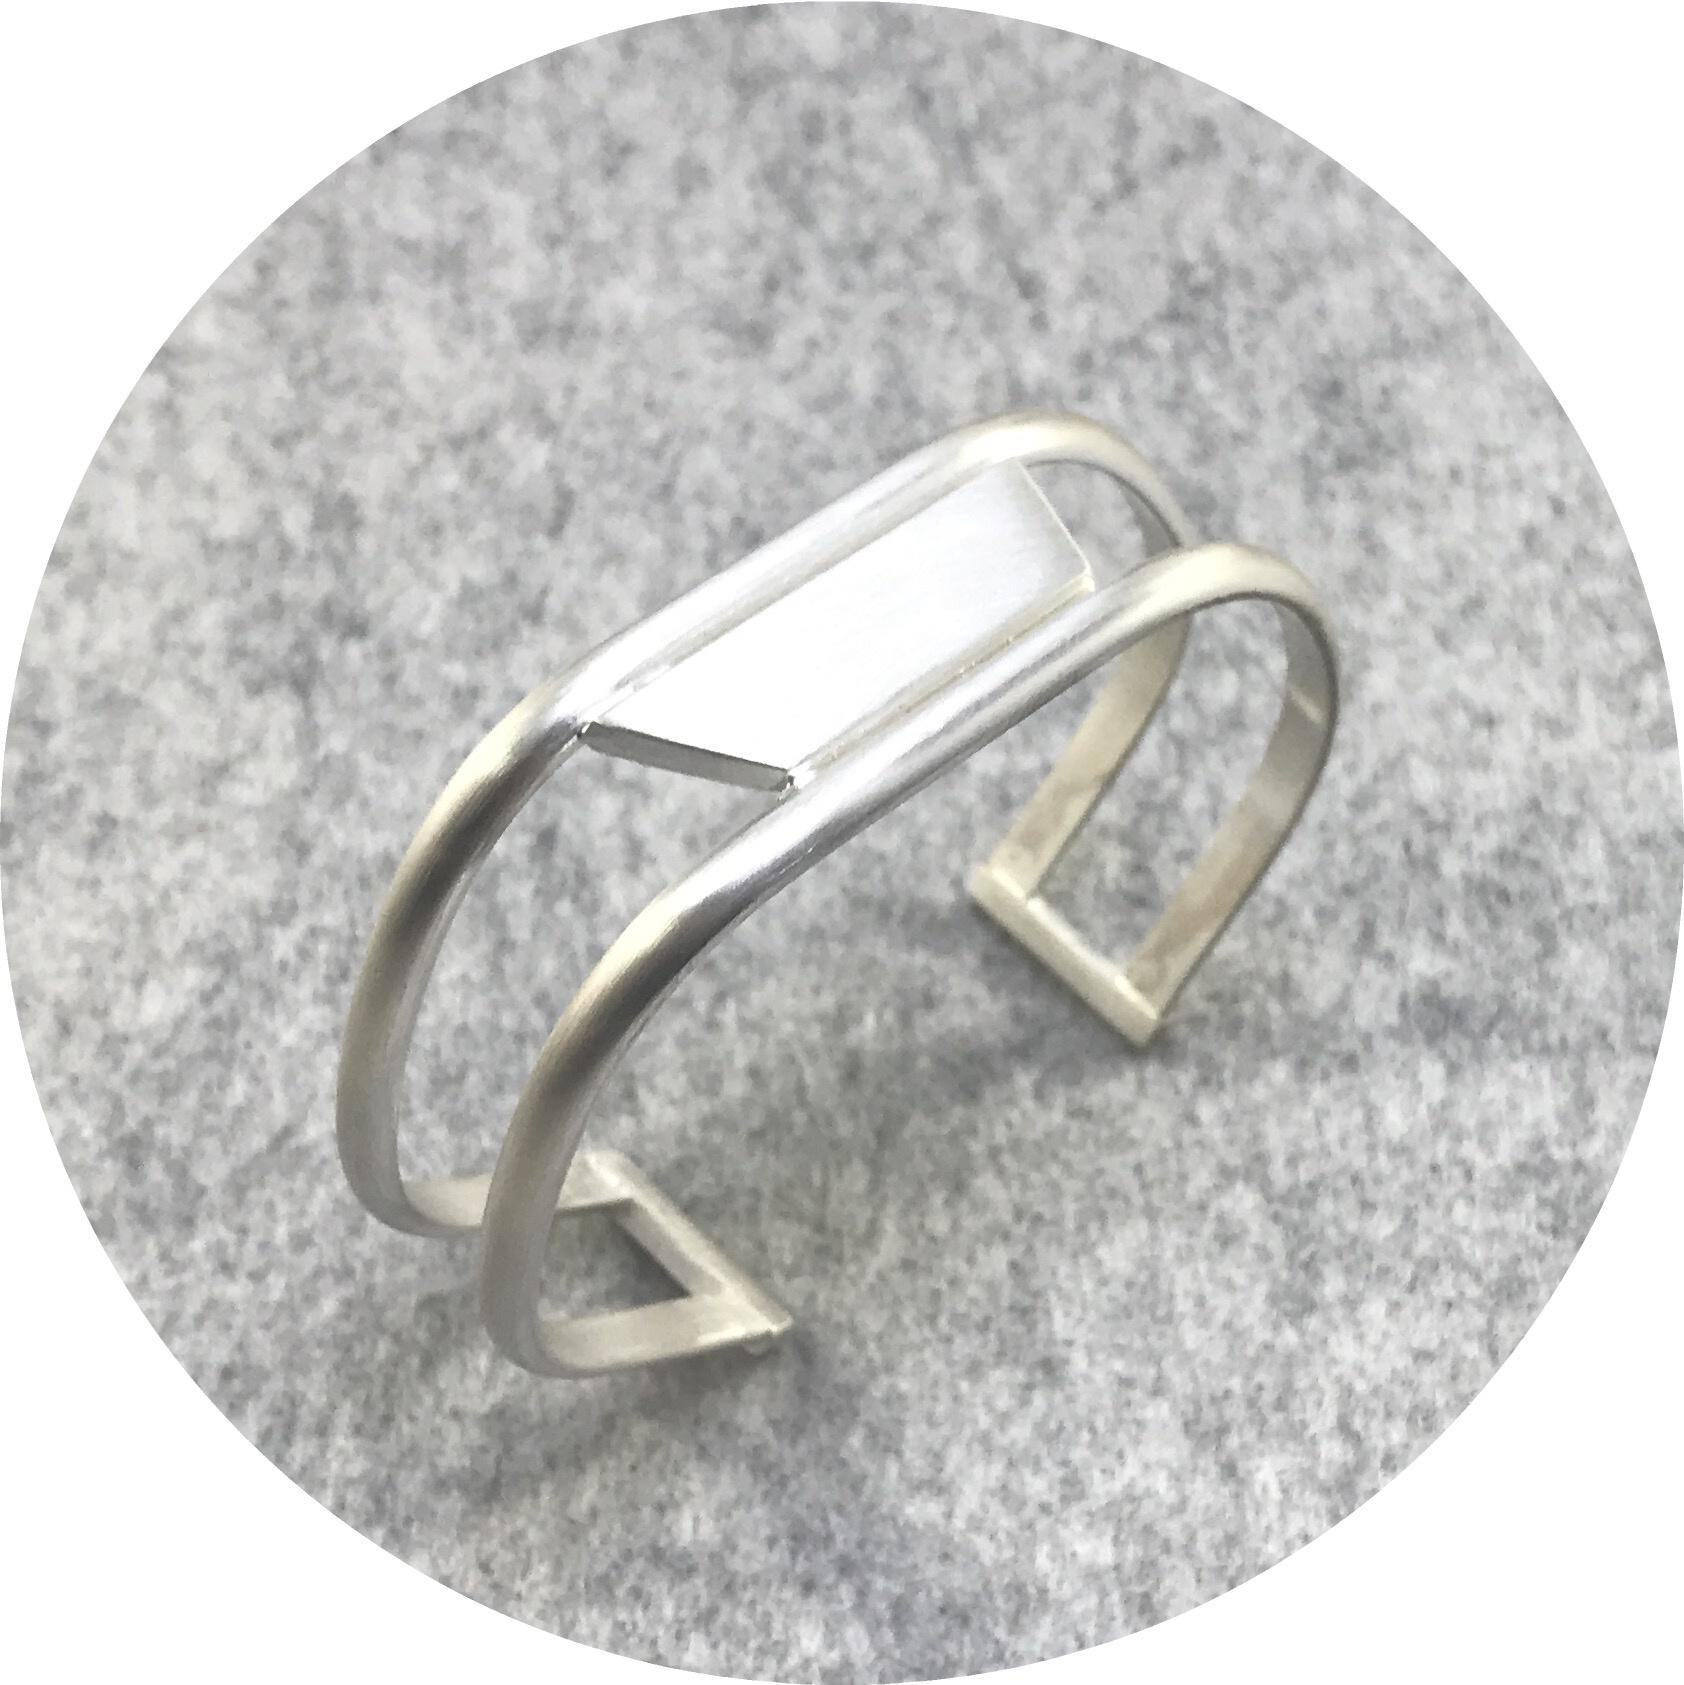 Rengin Guner- Geo Cuff. Sterling silver. Angled.